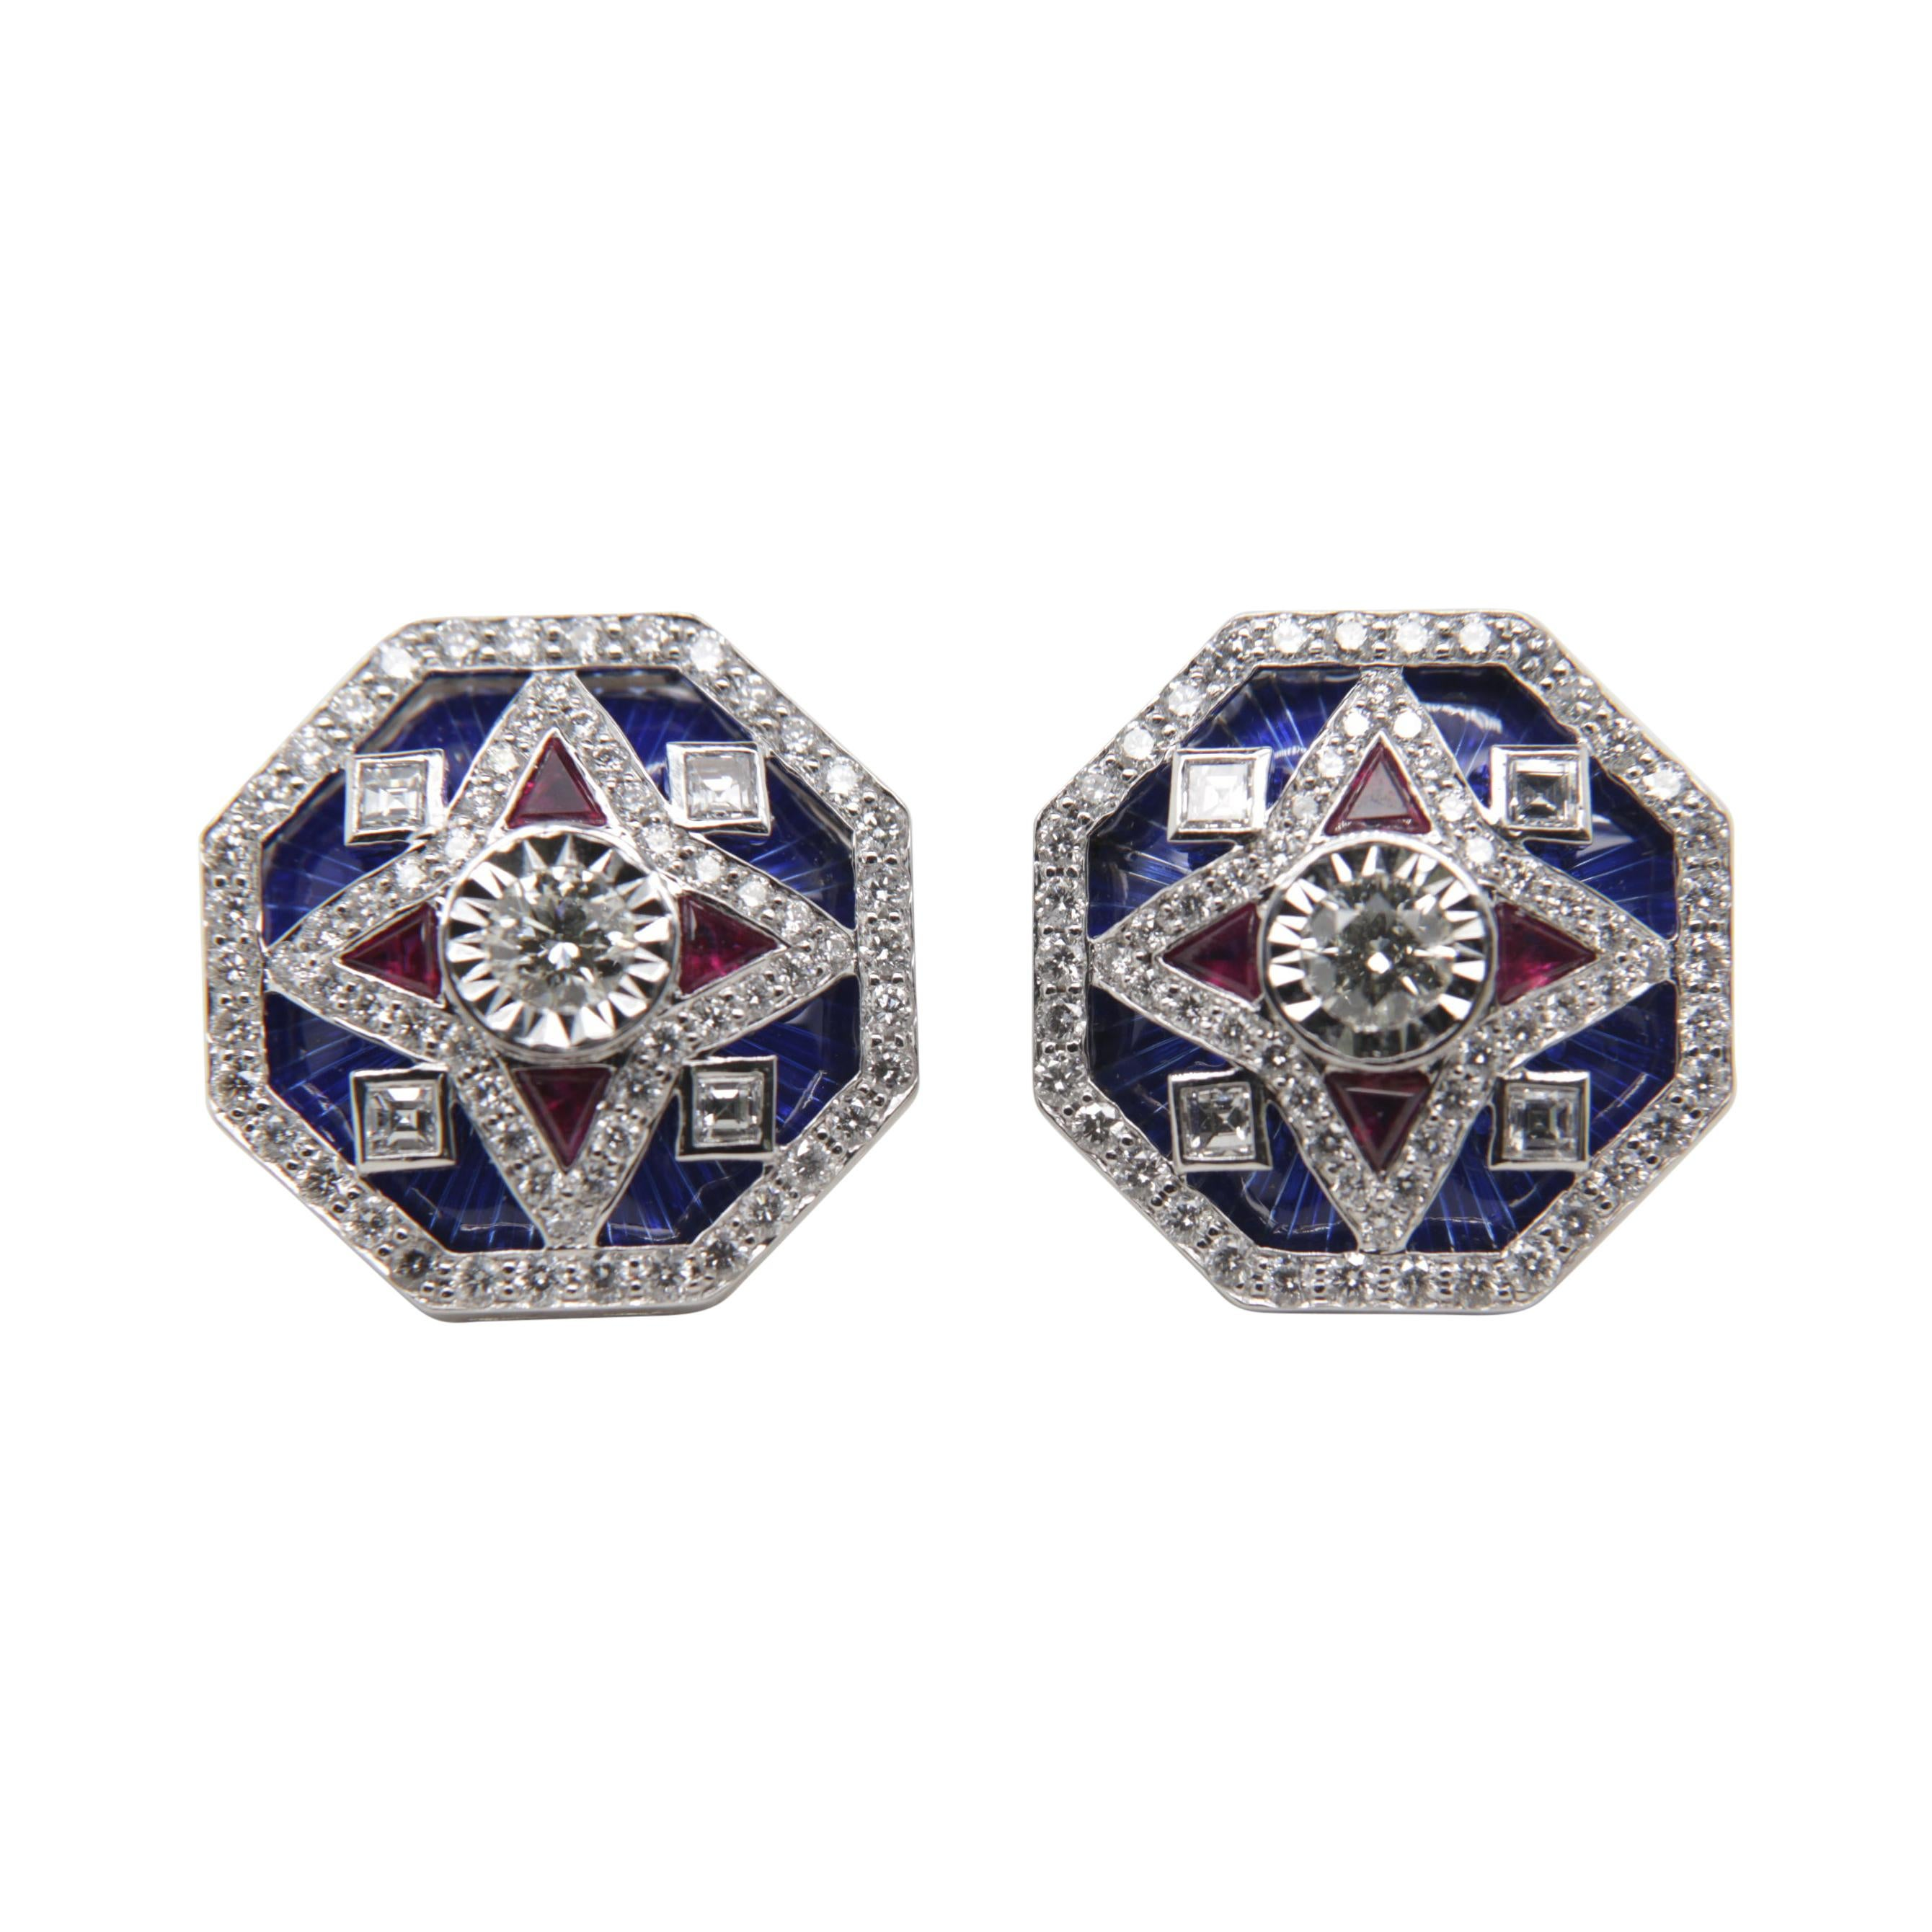 Diamond, Ruby and Enamel Cufflinks in 18 Karat Gold